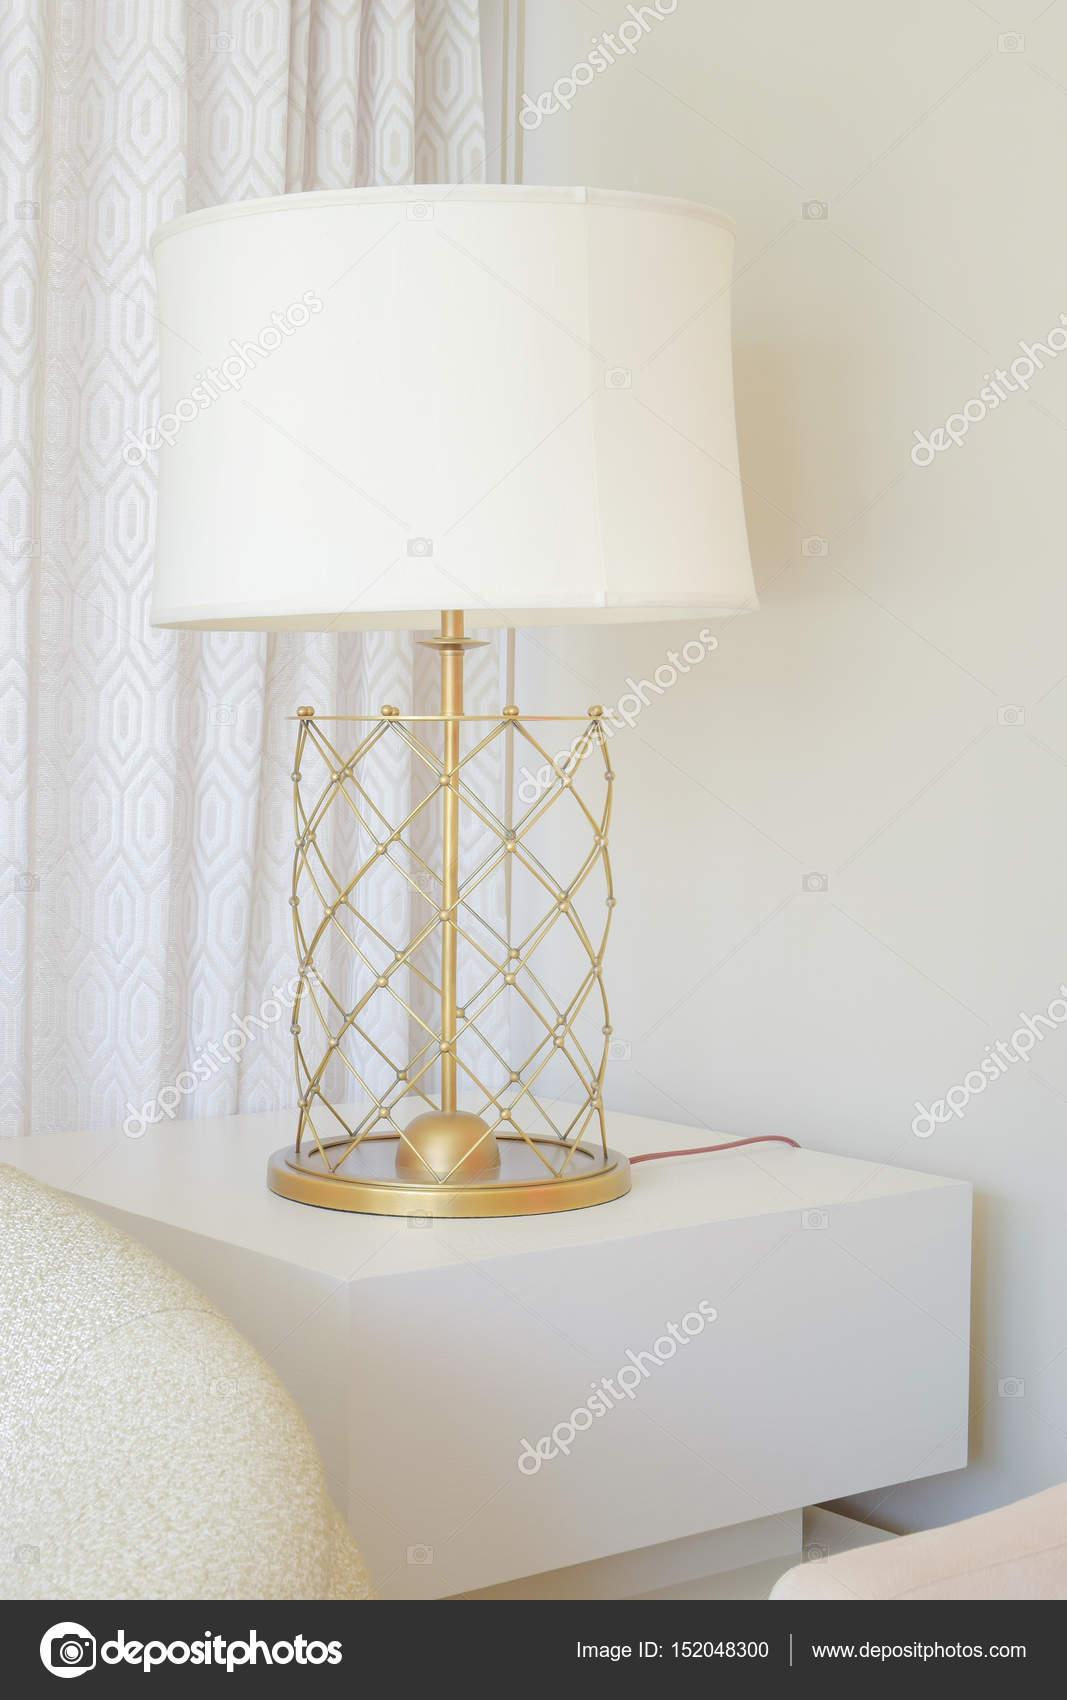 depositphotos 152048300 stock photo white shade table lamp with 5 Élégant Lampe Sejour Kgit4